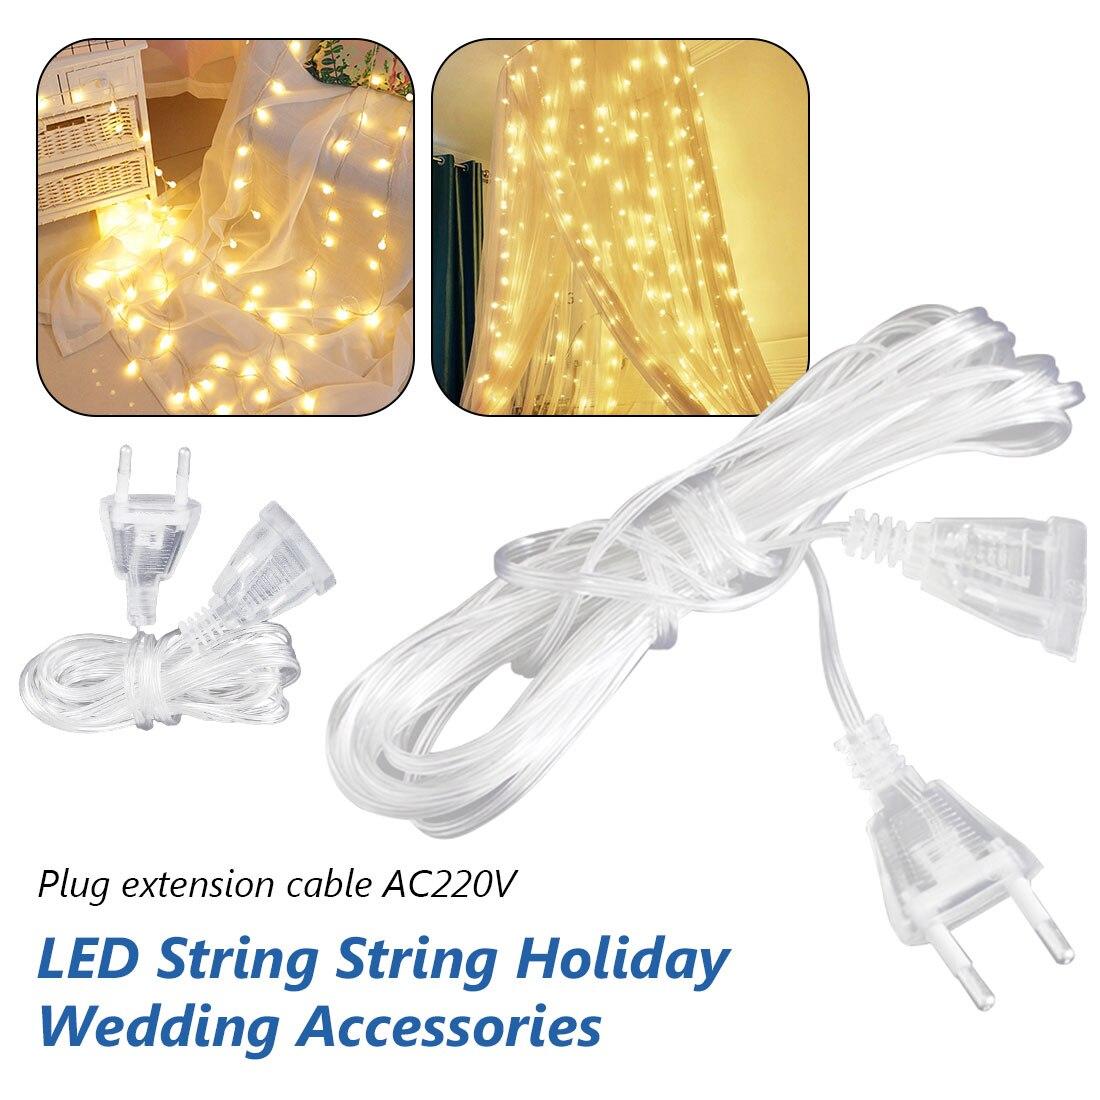 3M Led Strip  Power LED Extension Cable Extender Wire For LED String Light Christmas Lights EU Plug  AC 220V